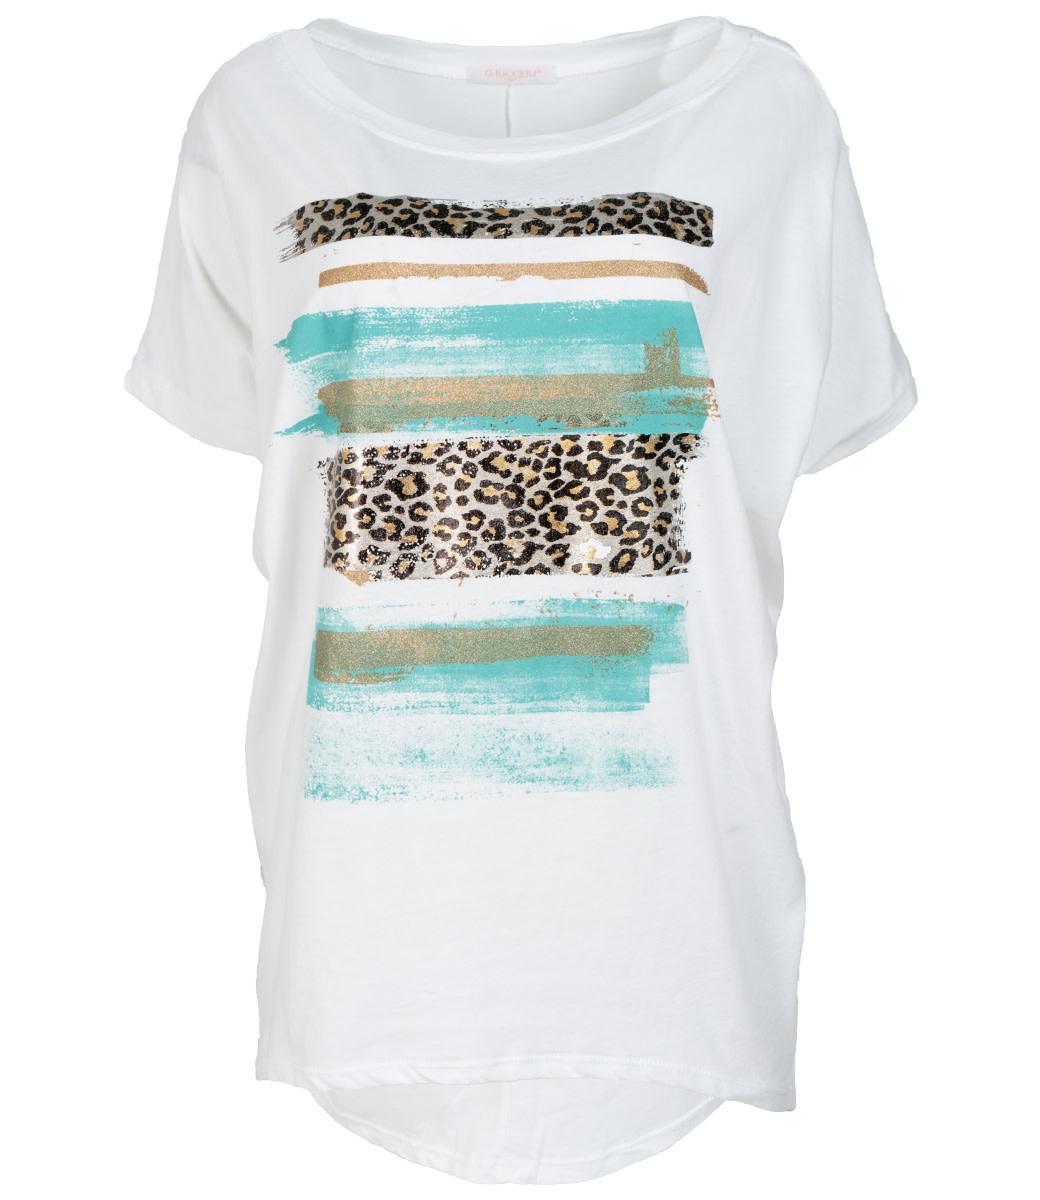 Gemma Ricceri Shirt wit/turquoise Chloe